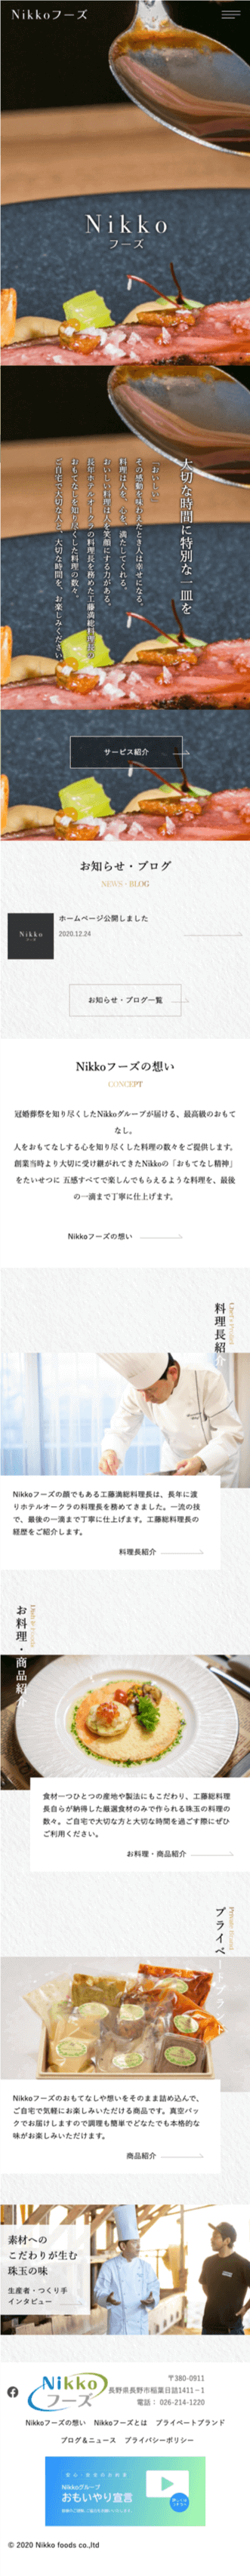 Nikkoフーズspイメージ